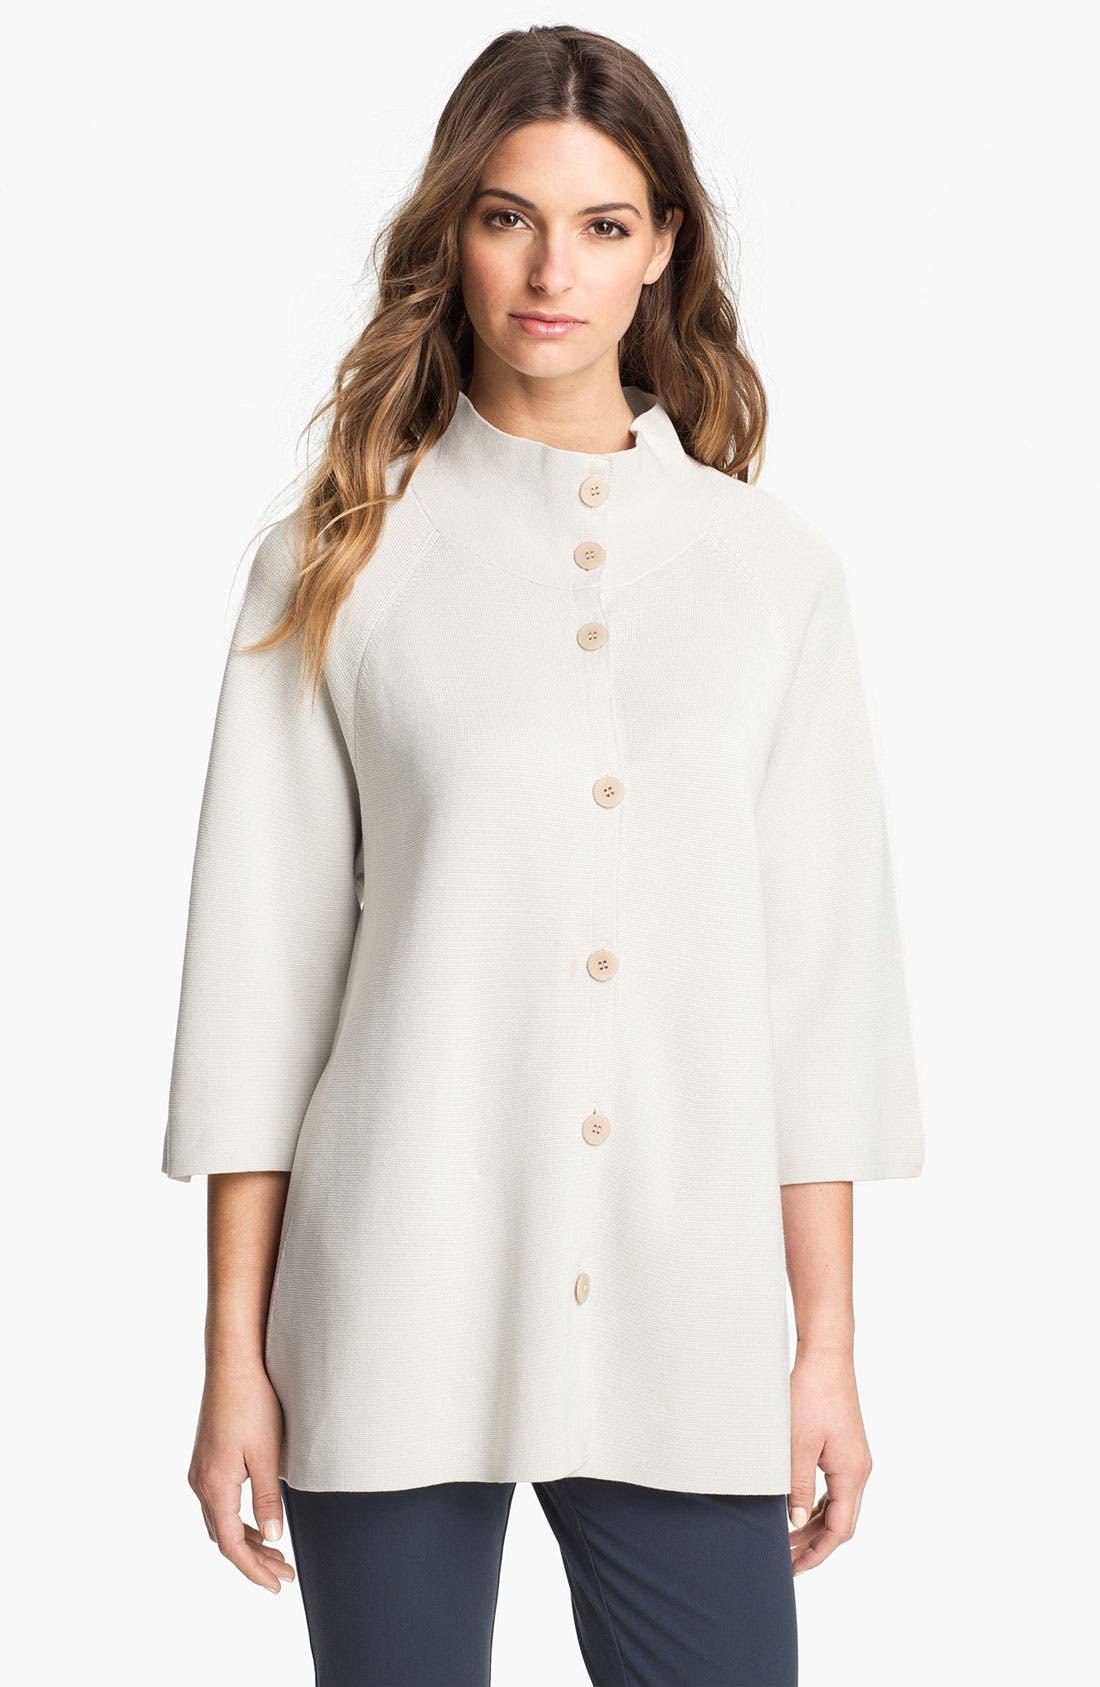 Alternate Image 1 Selected - Eileen Fisher Silk & Cotton Interlock Knit Jacket (Petite)